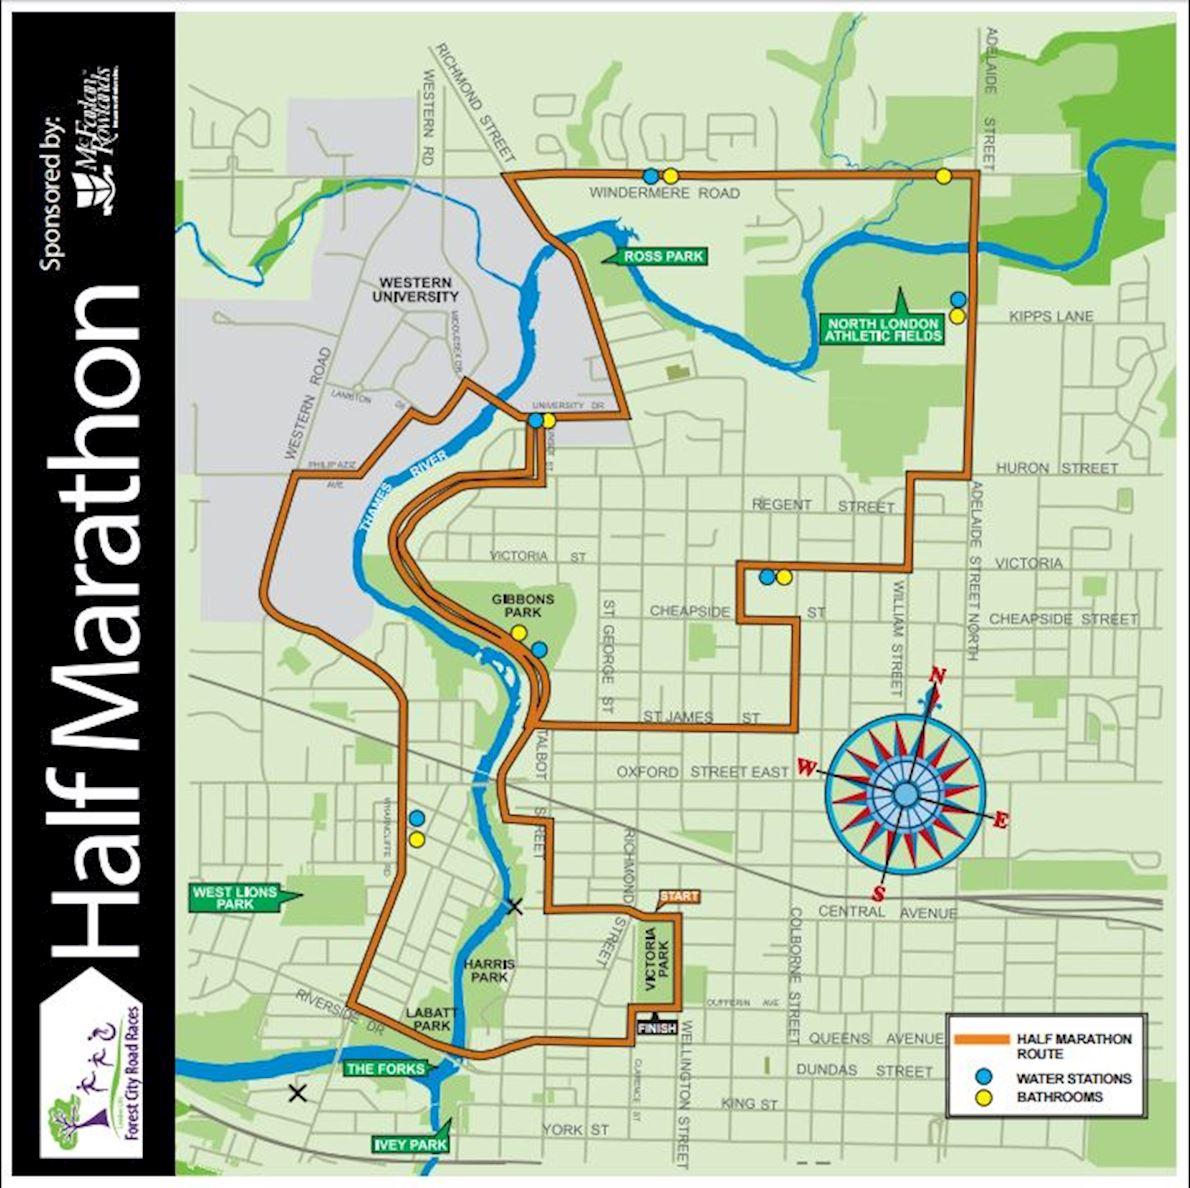 London Life Forest City Road Races Mappa del percorso